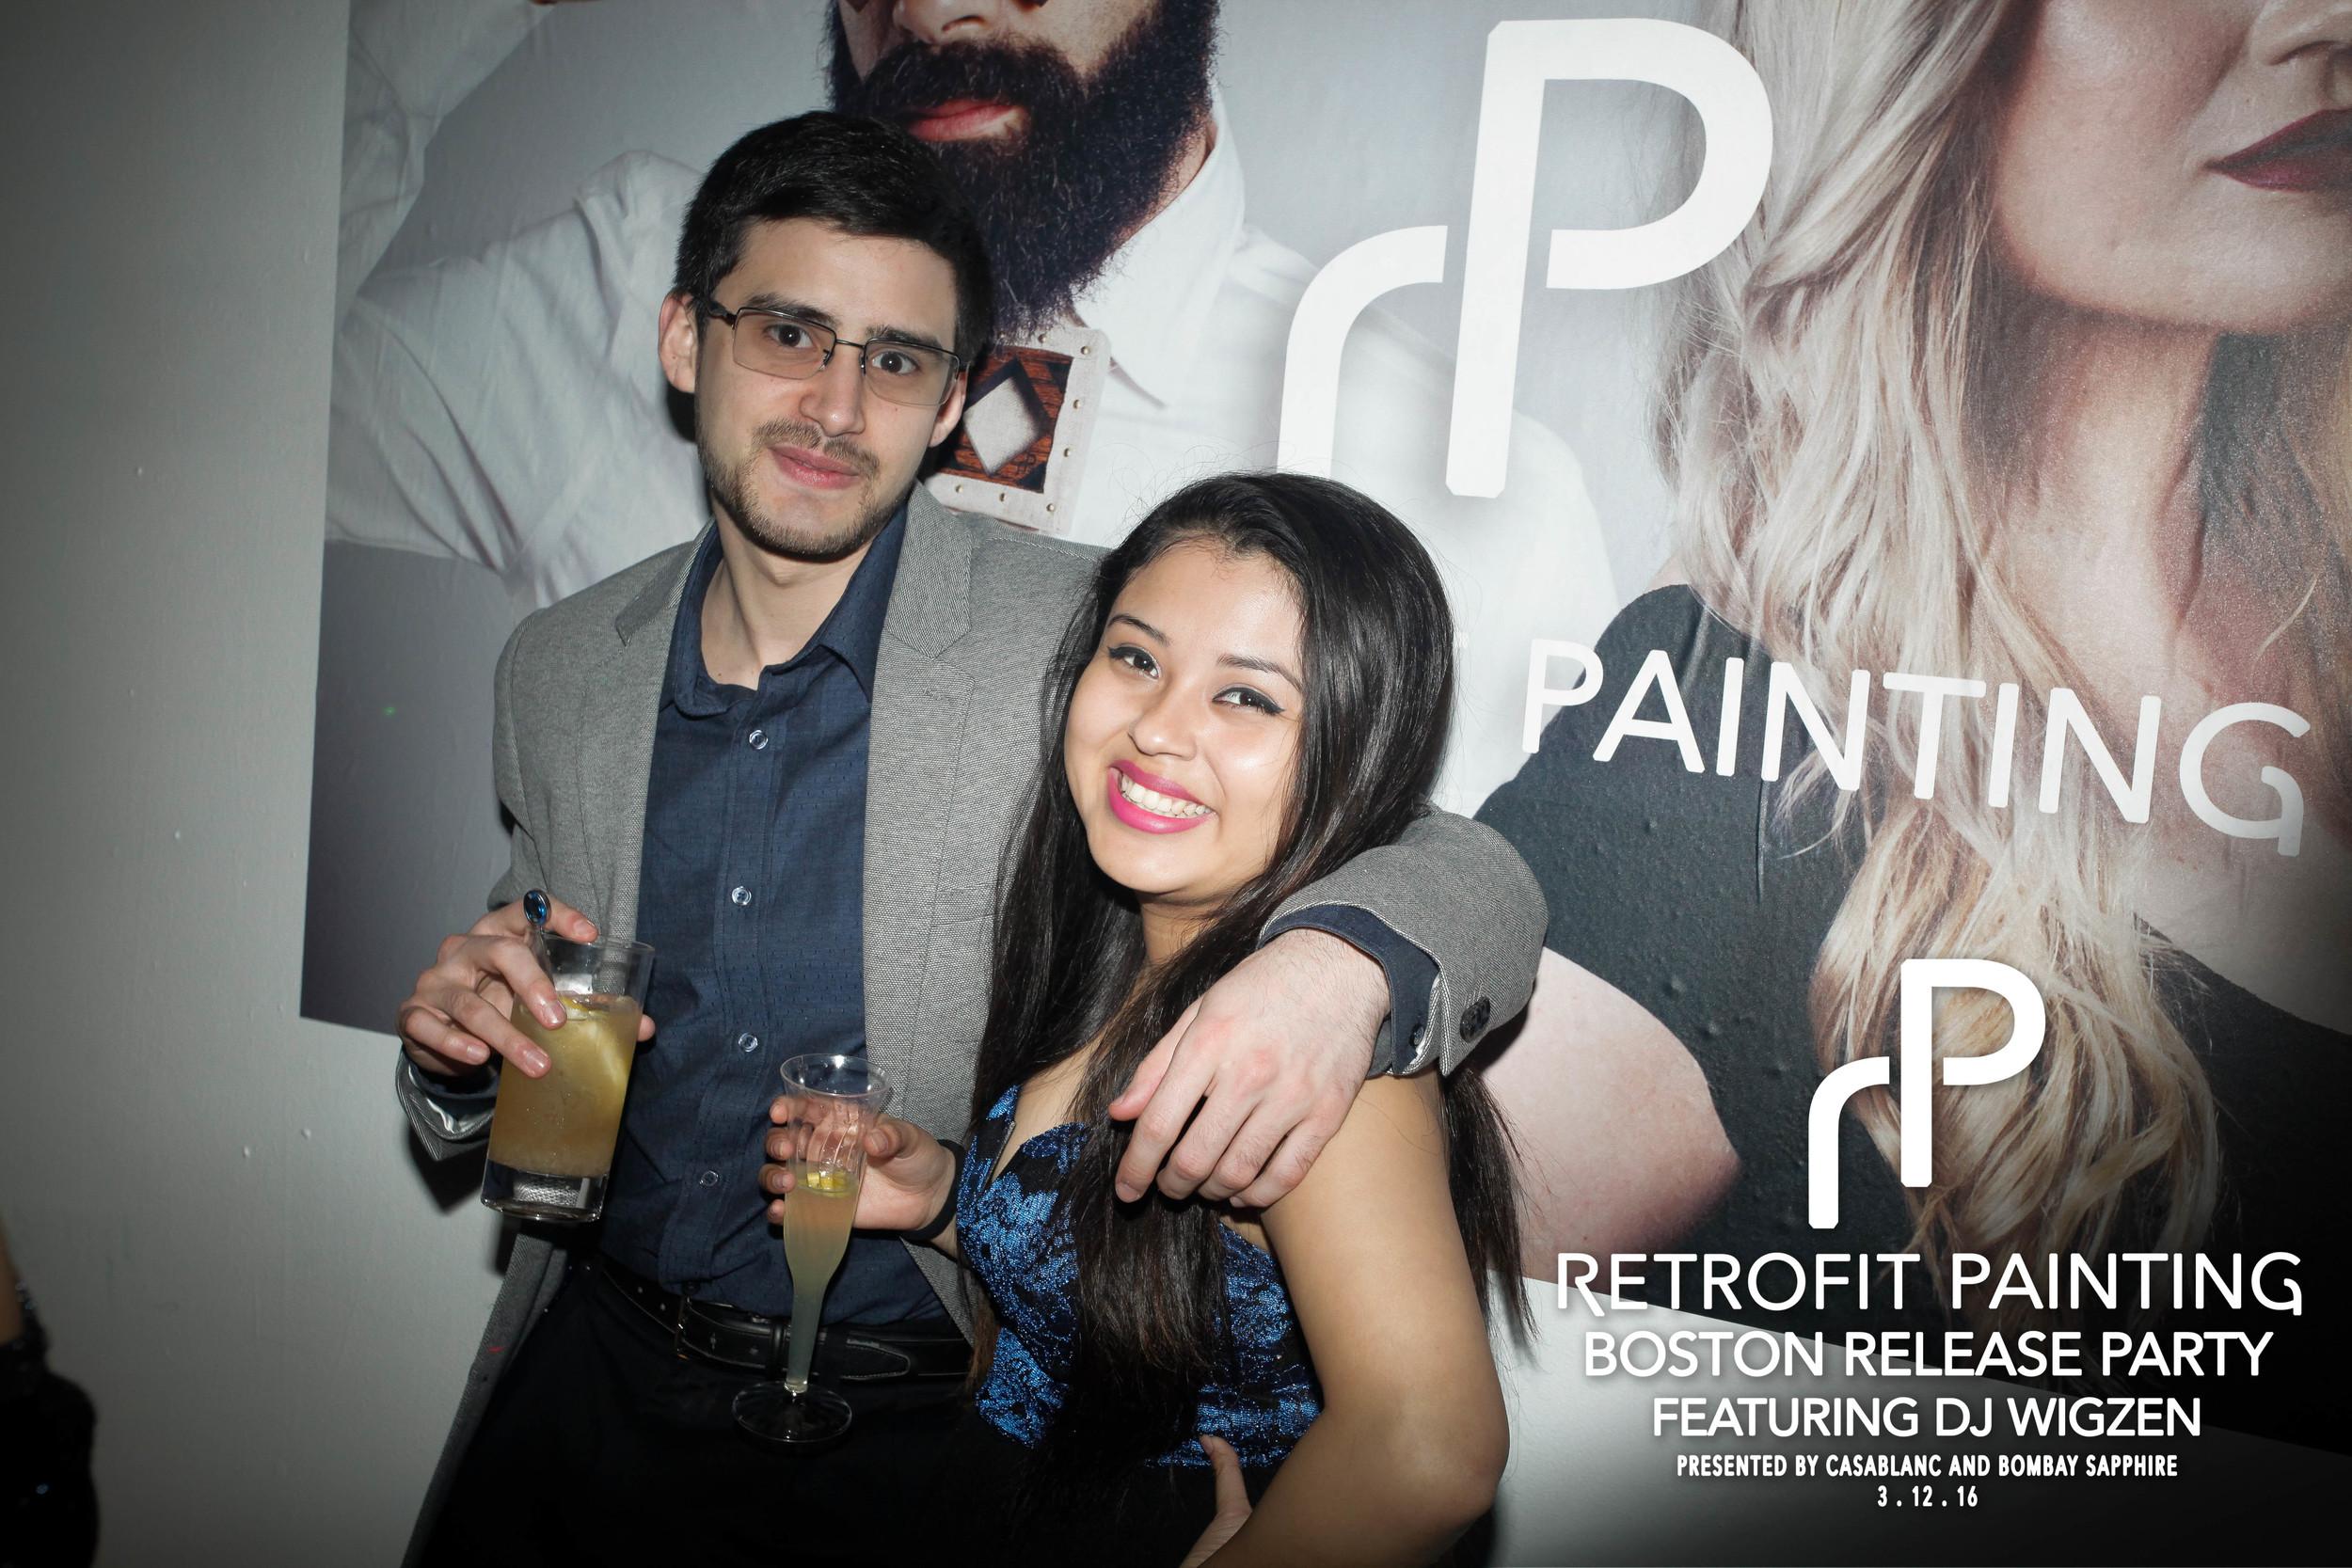 Retrofit Painting Boston Release Party 0151.jpg